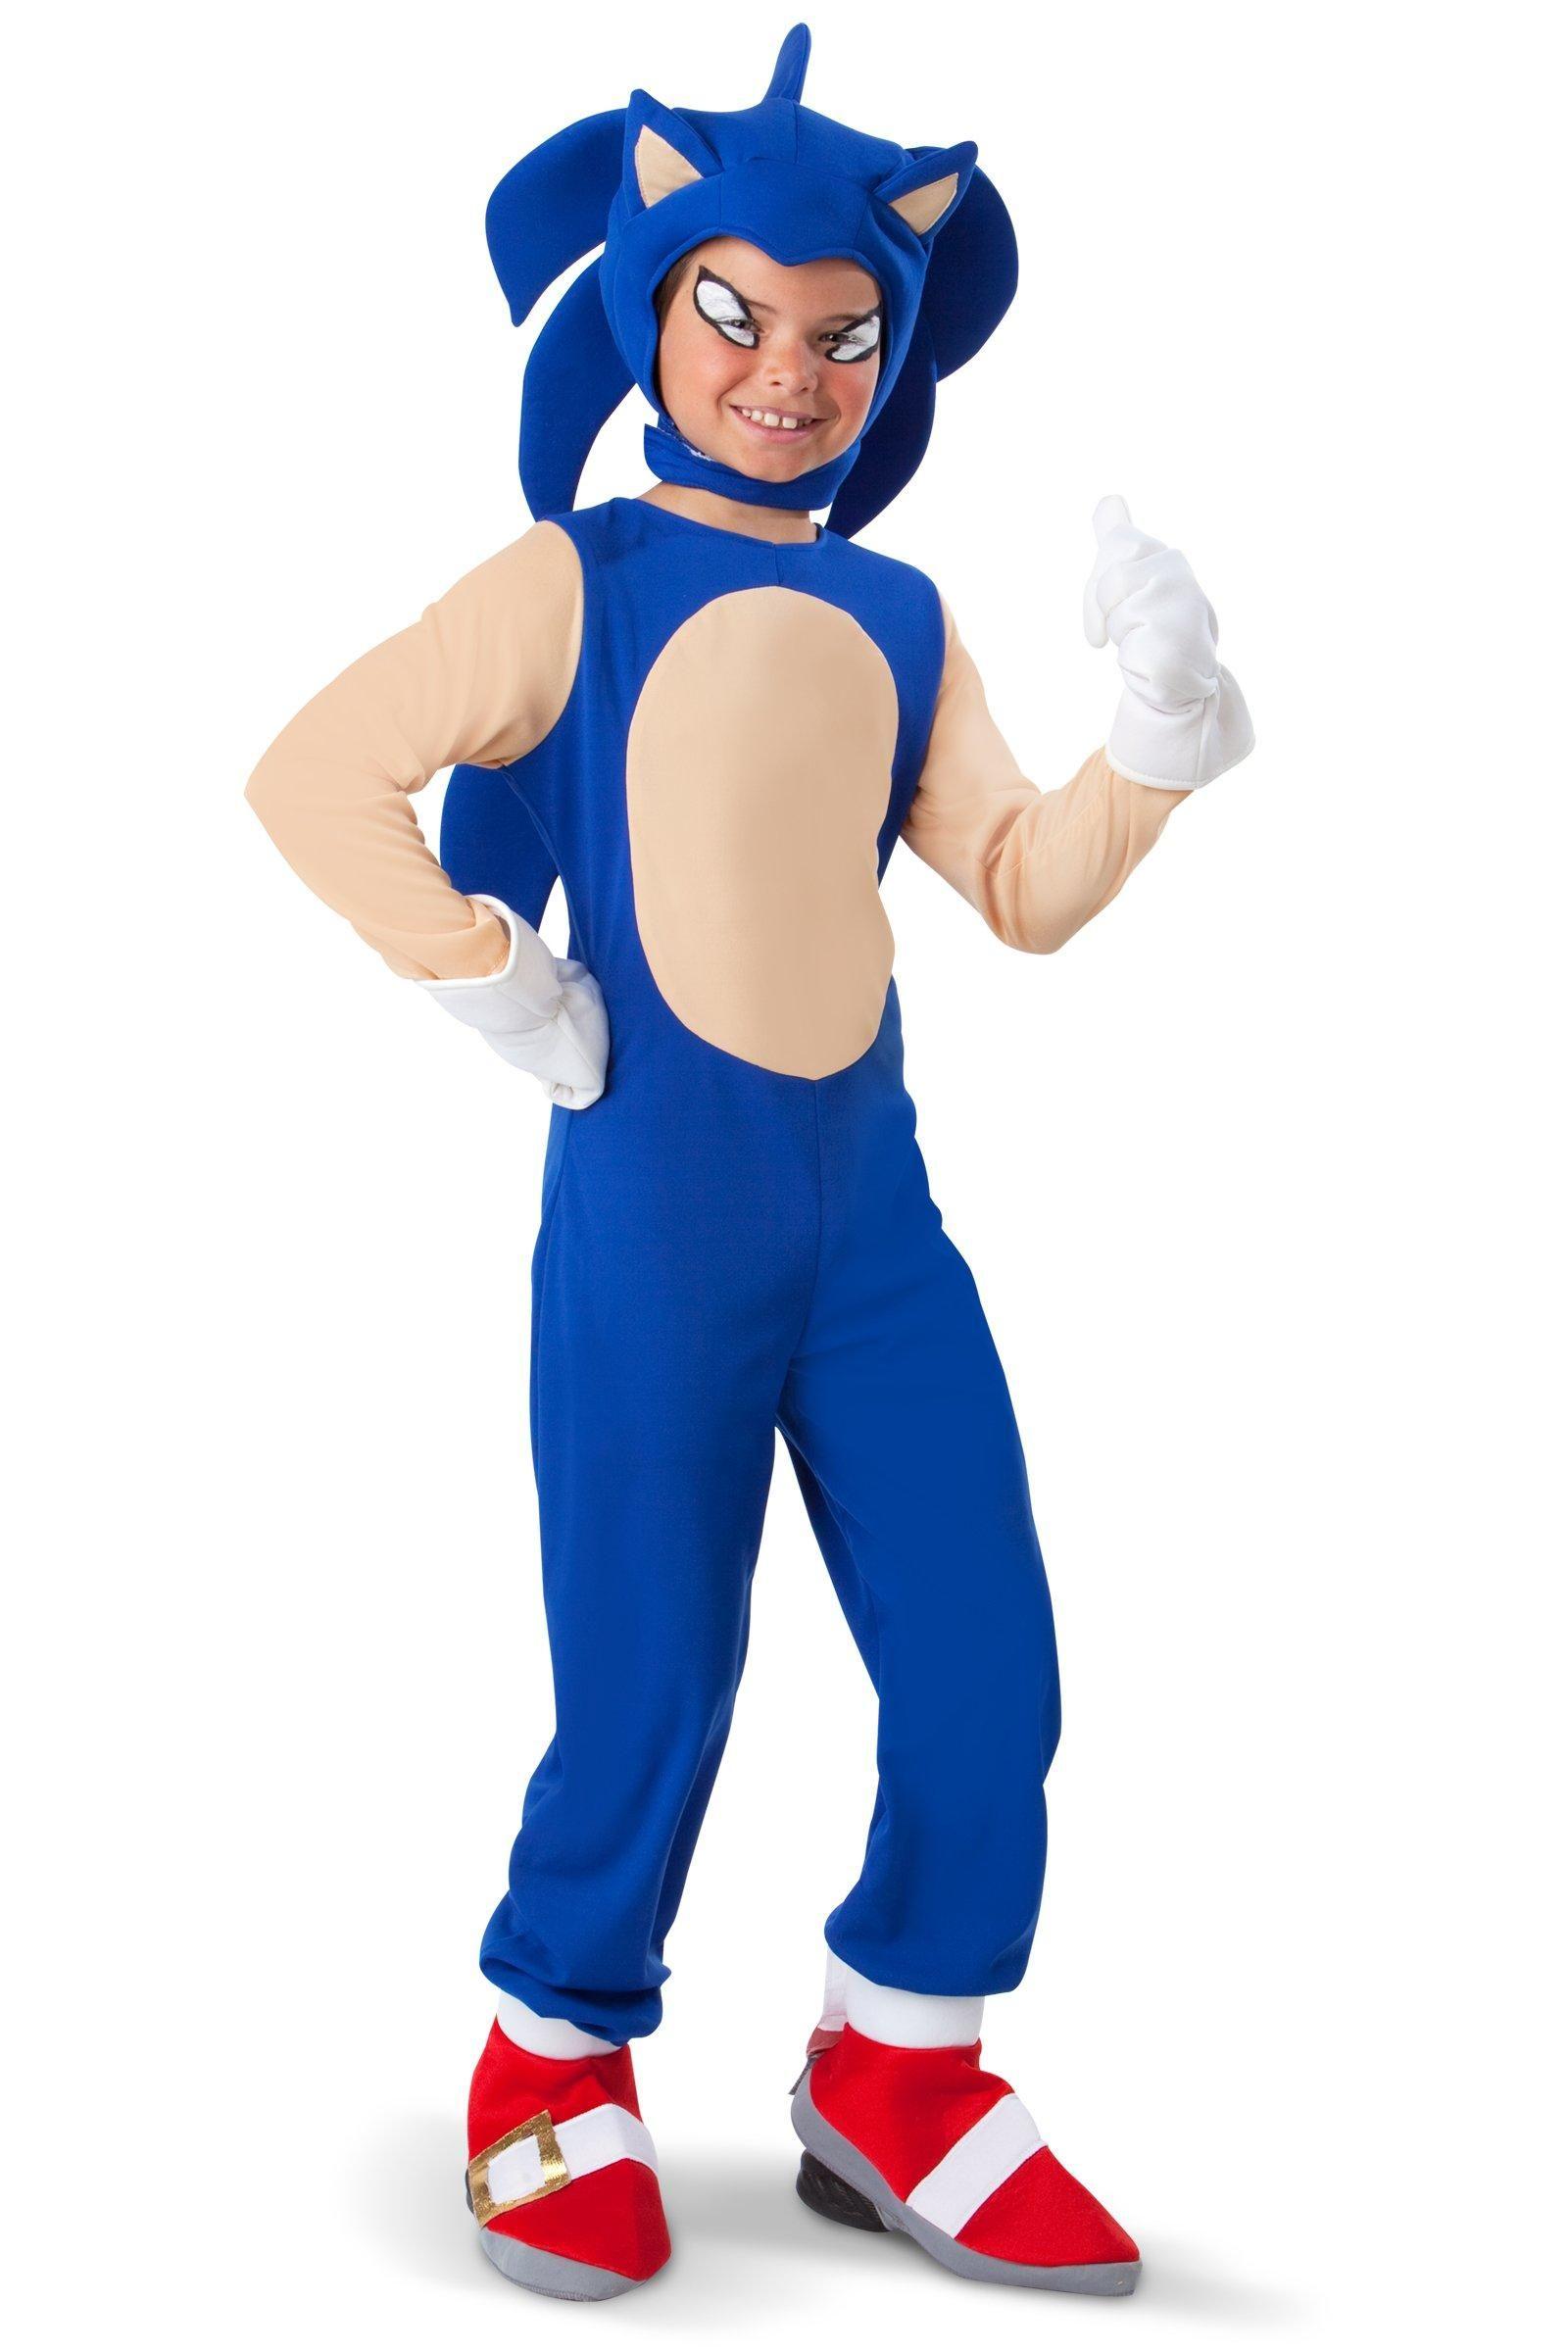 Sonic The Hedgehog Sonic Kids Costume Sonic The Hedgehog Halloween Costume Sonic Costume Sonic The Hedgehog Costume